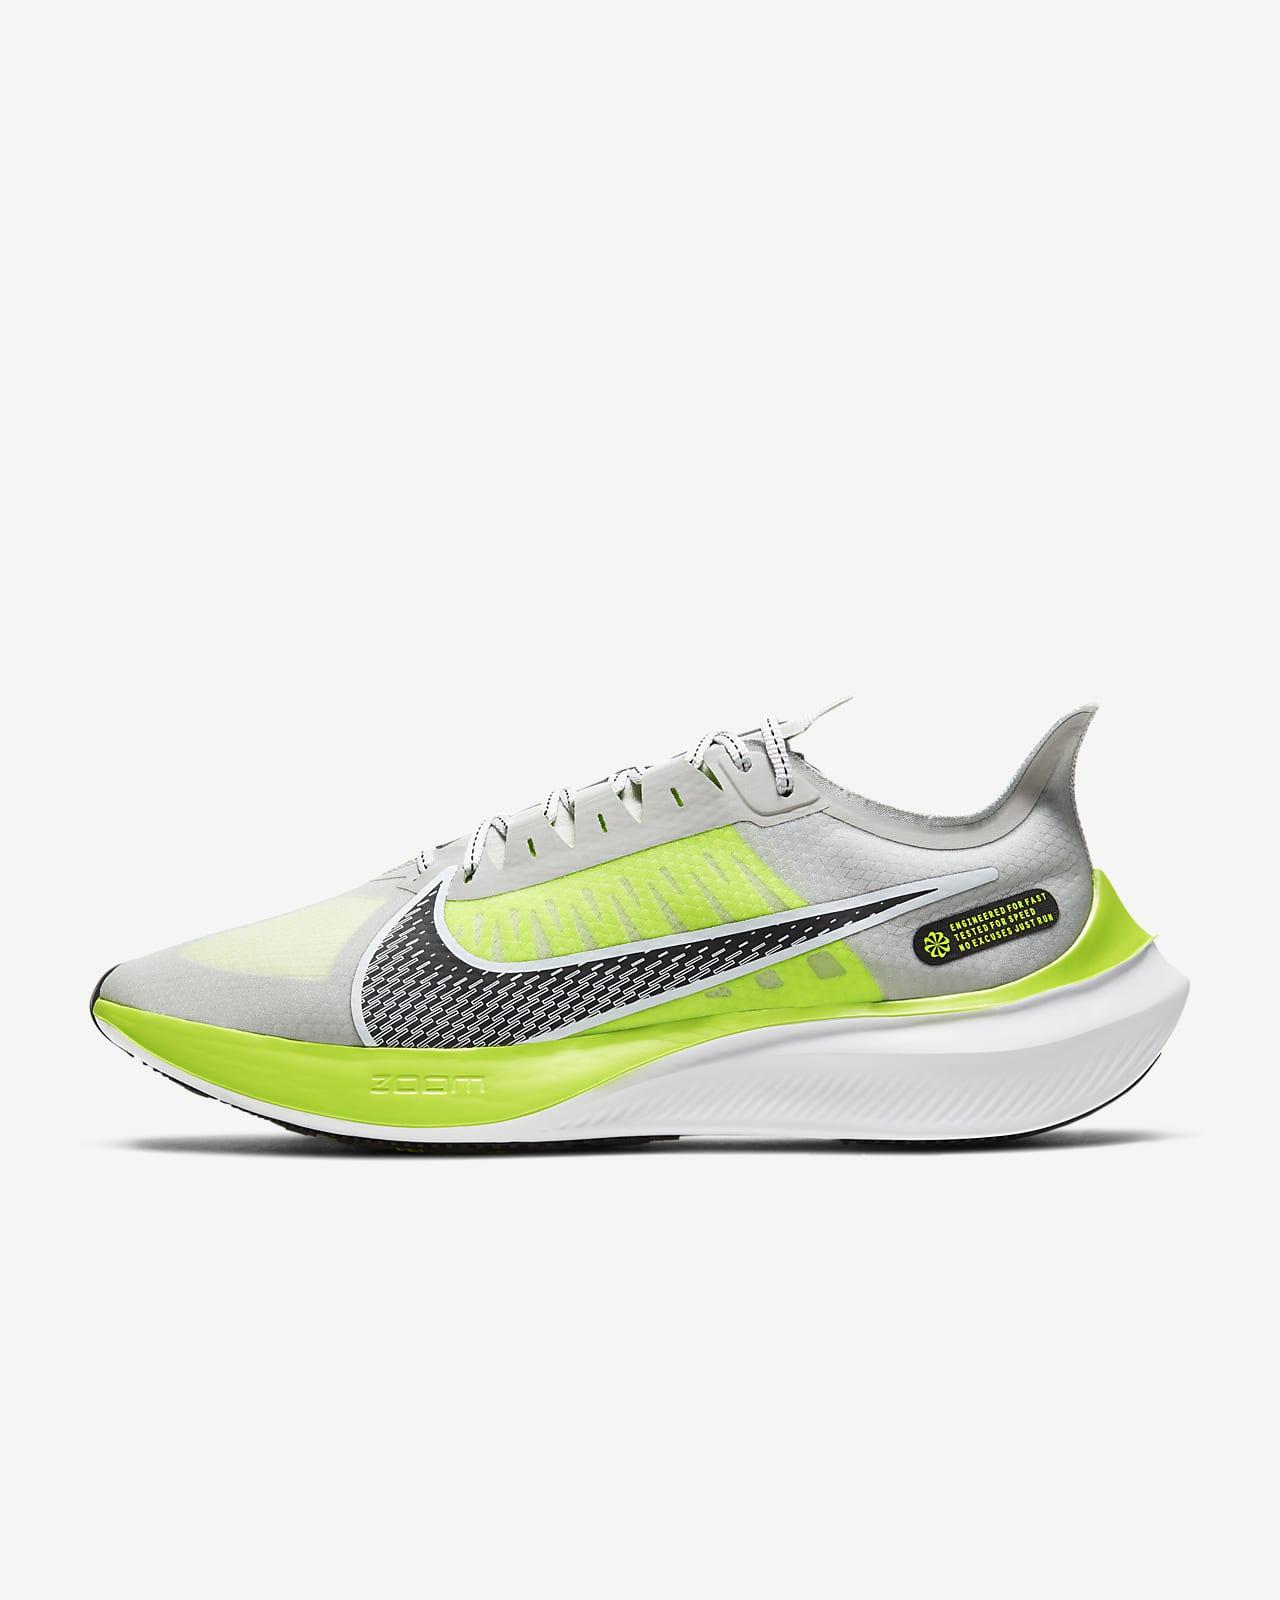 Nike Zoom Gravity Men's Running Shoe